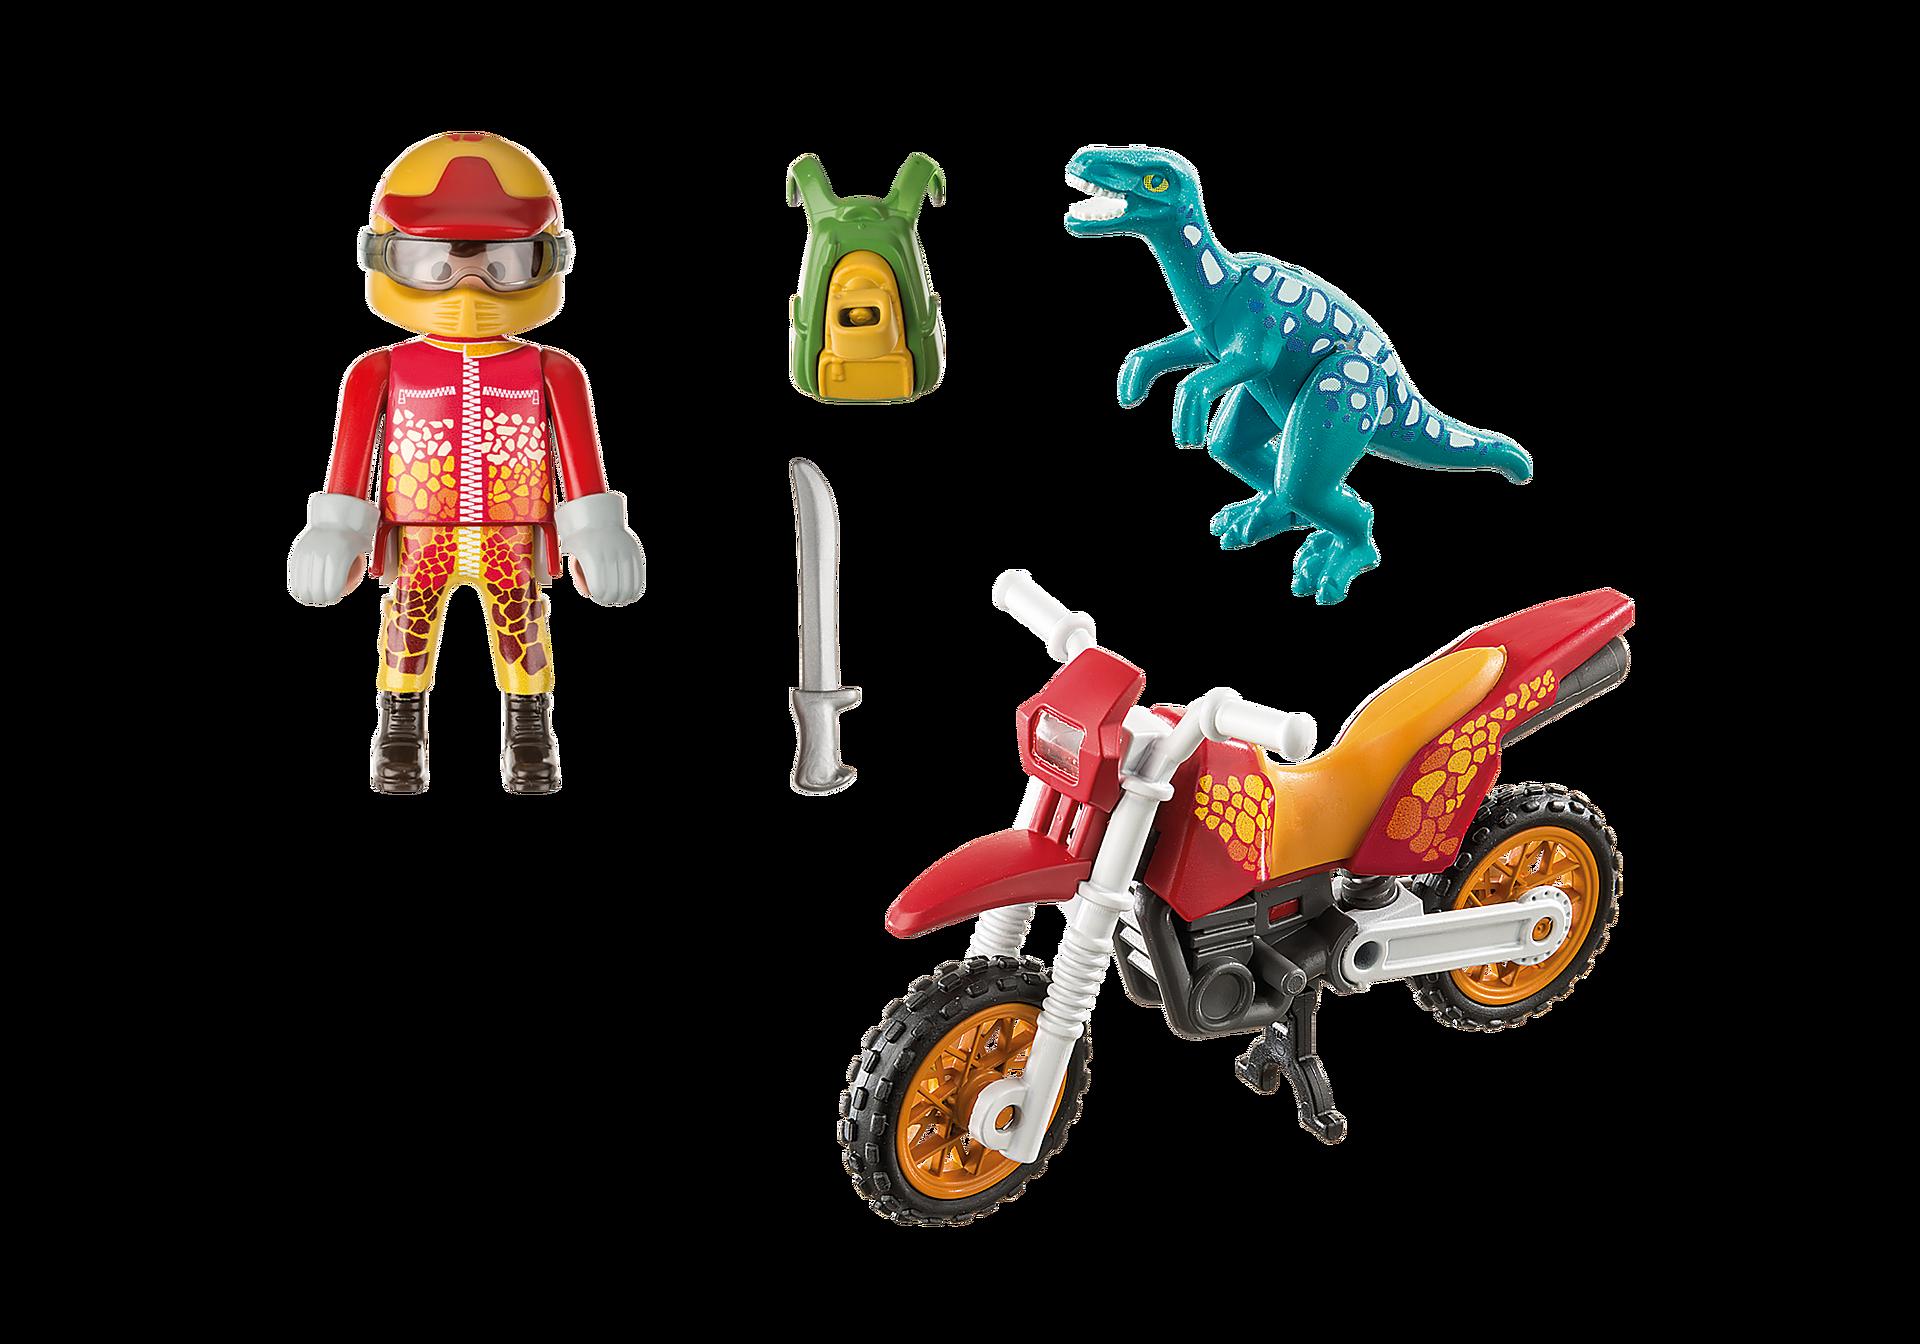 9431 Motocross Bike with Raptor zoom image4